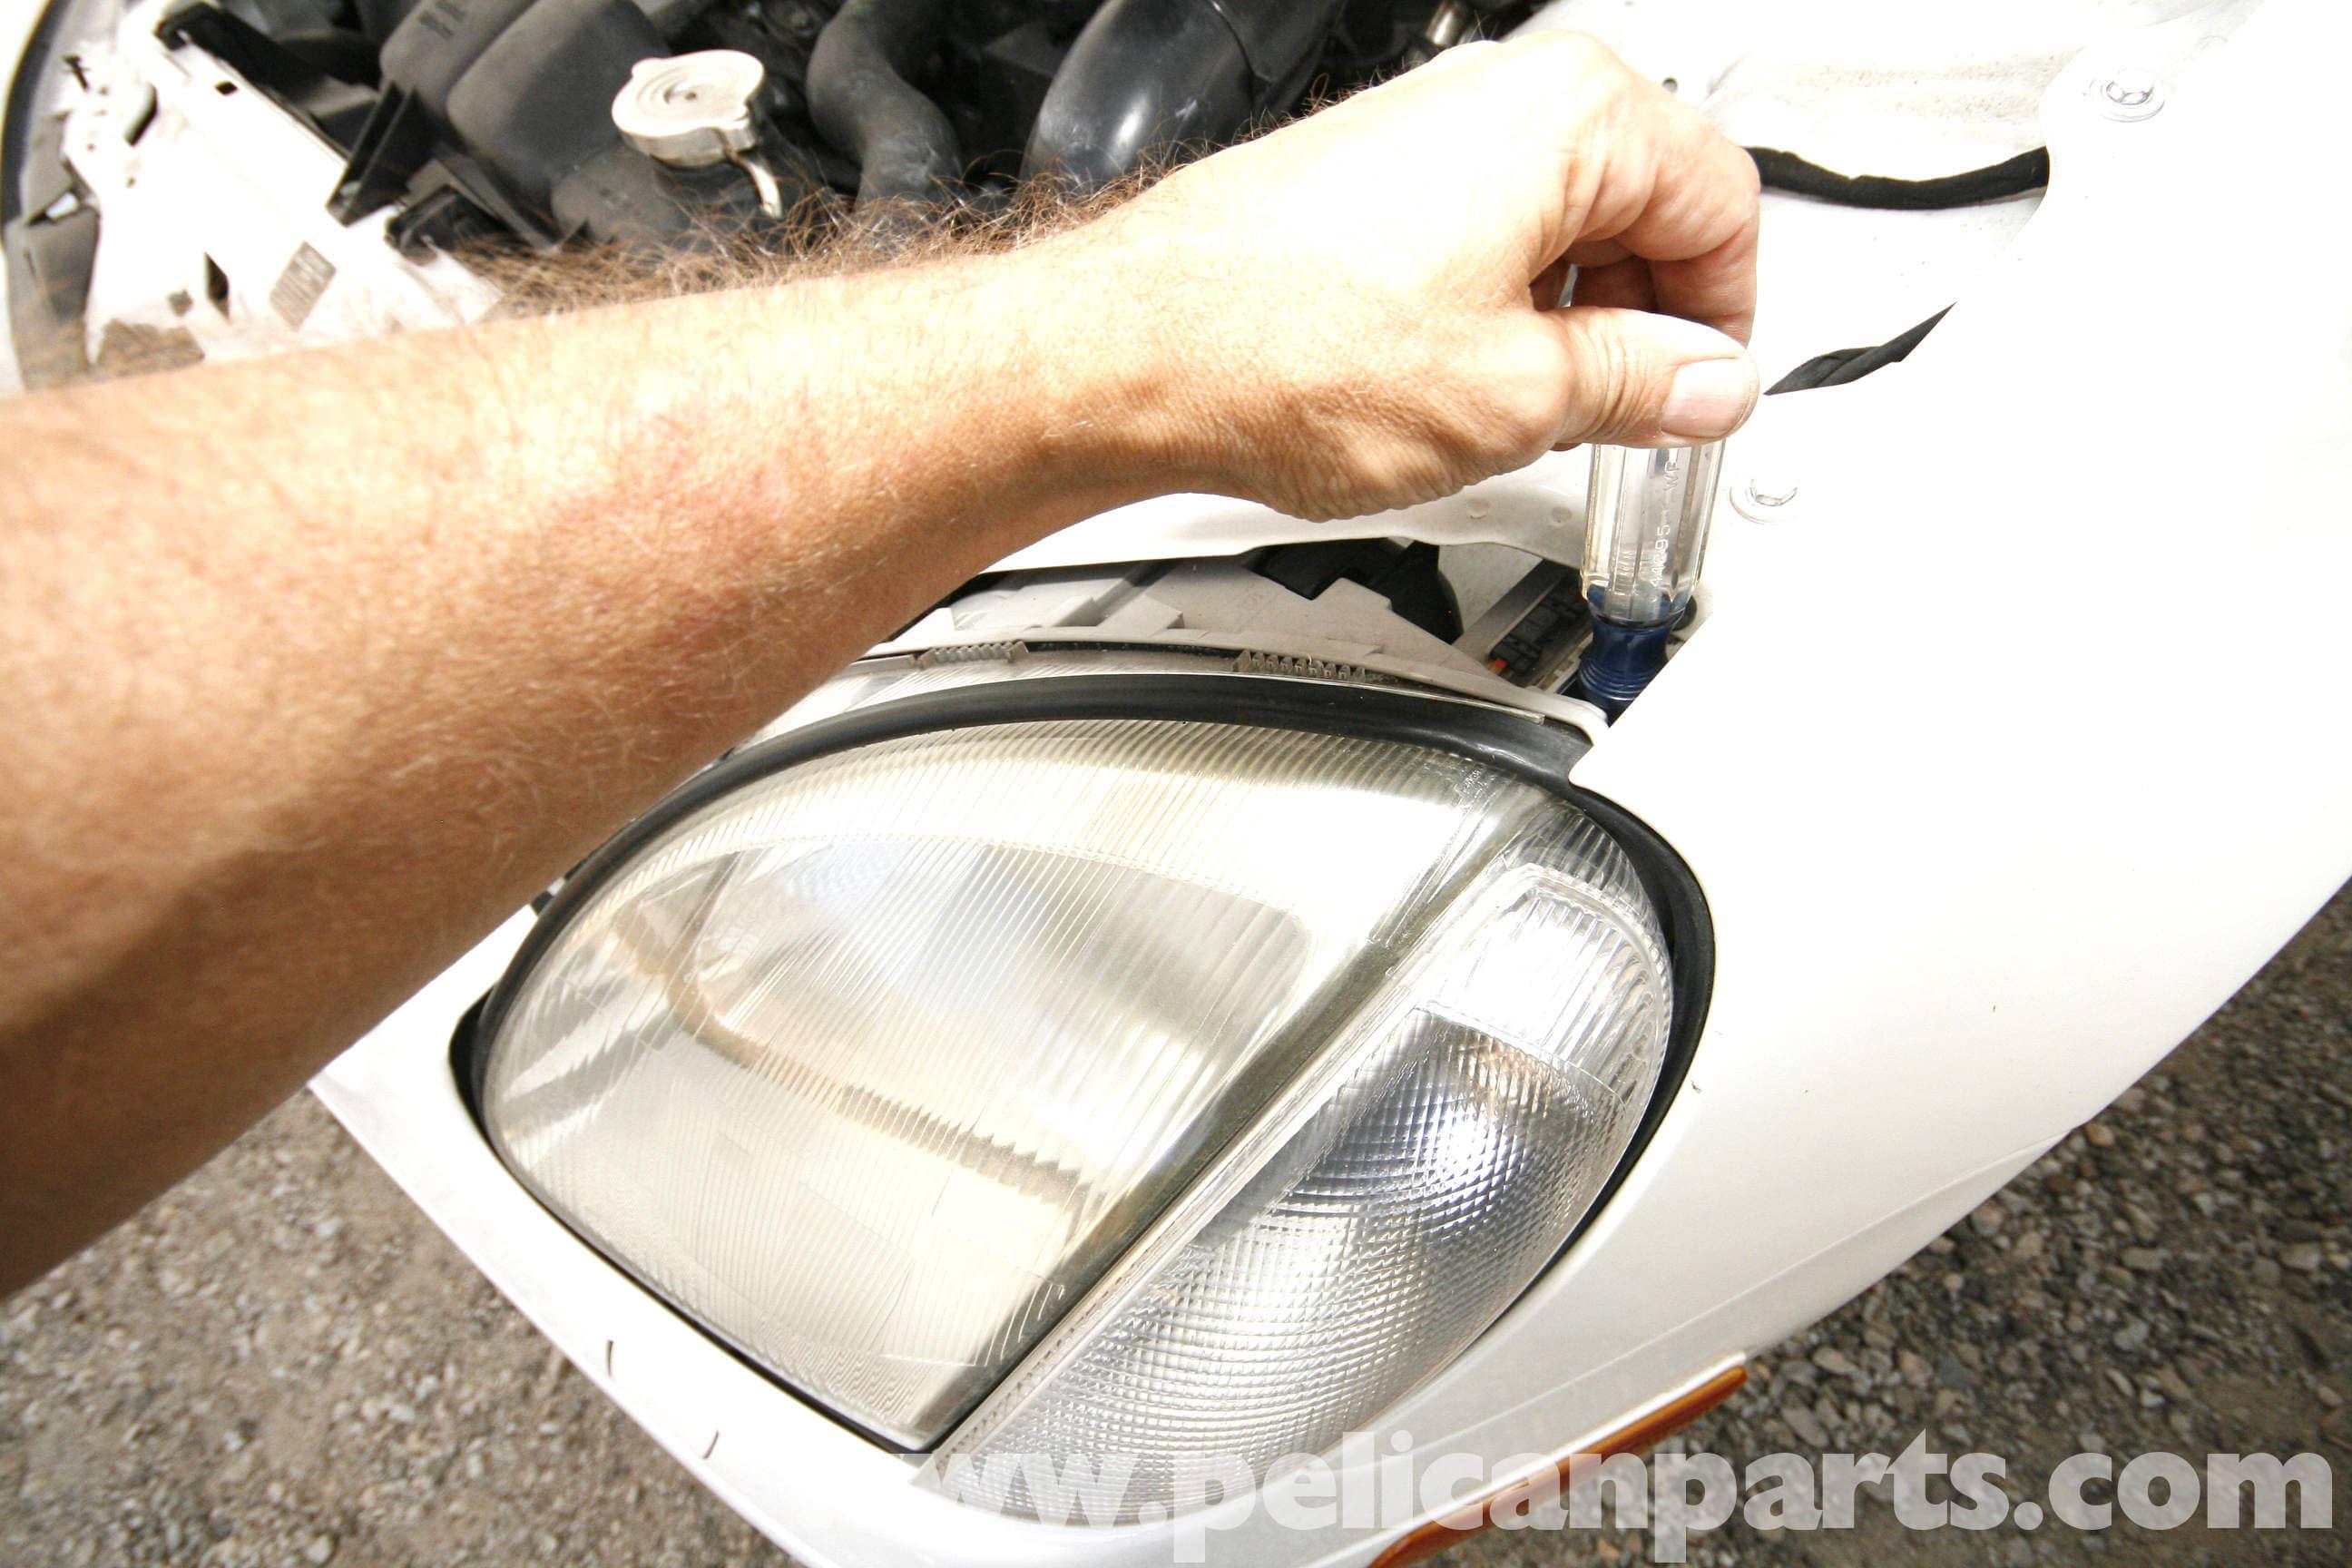 Mercedes SLK R170 Clear Halogen Xenon HID Parking Beam Side Light Bulbs